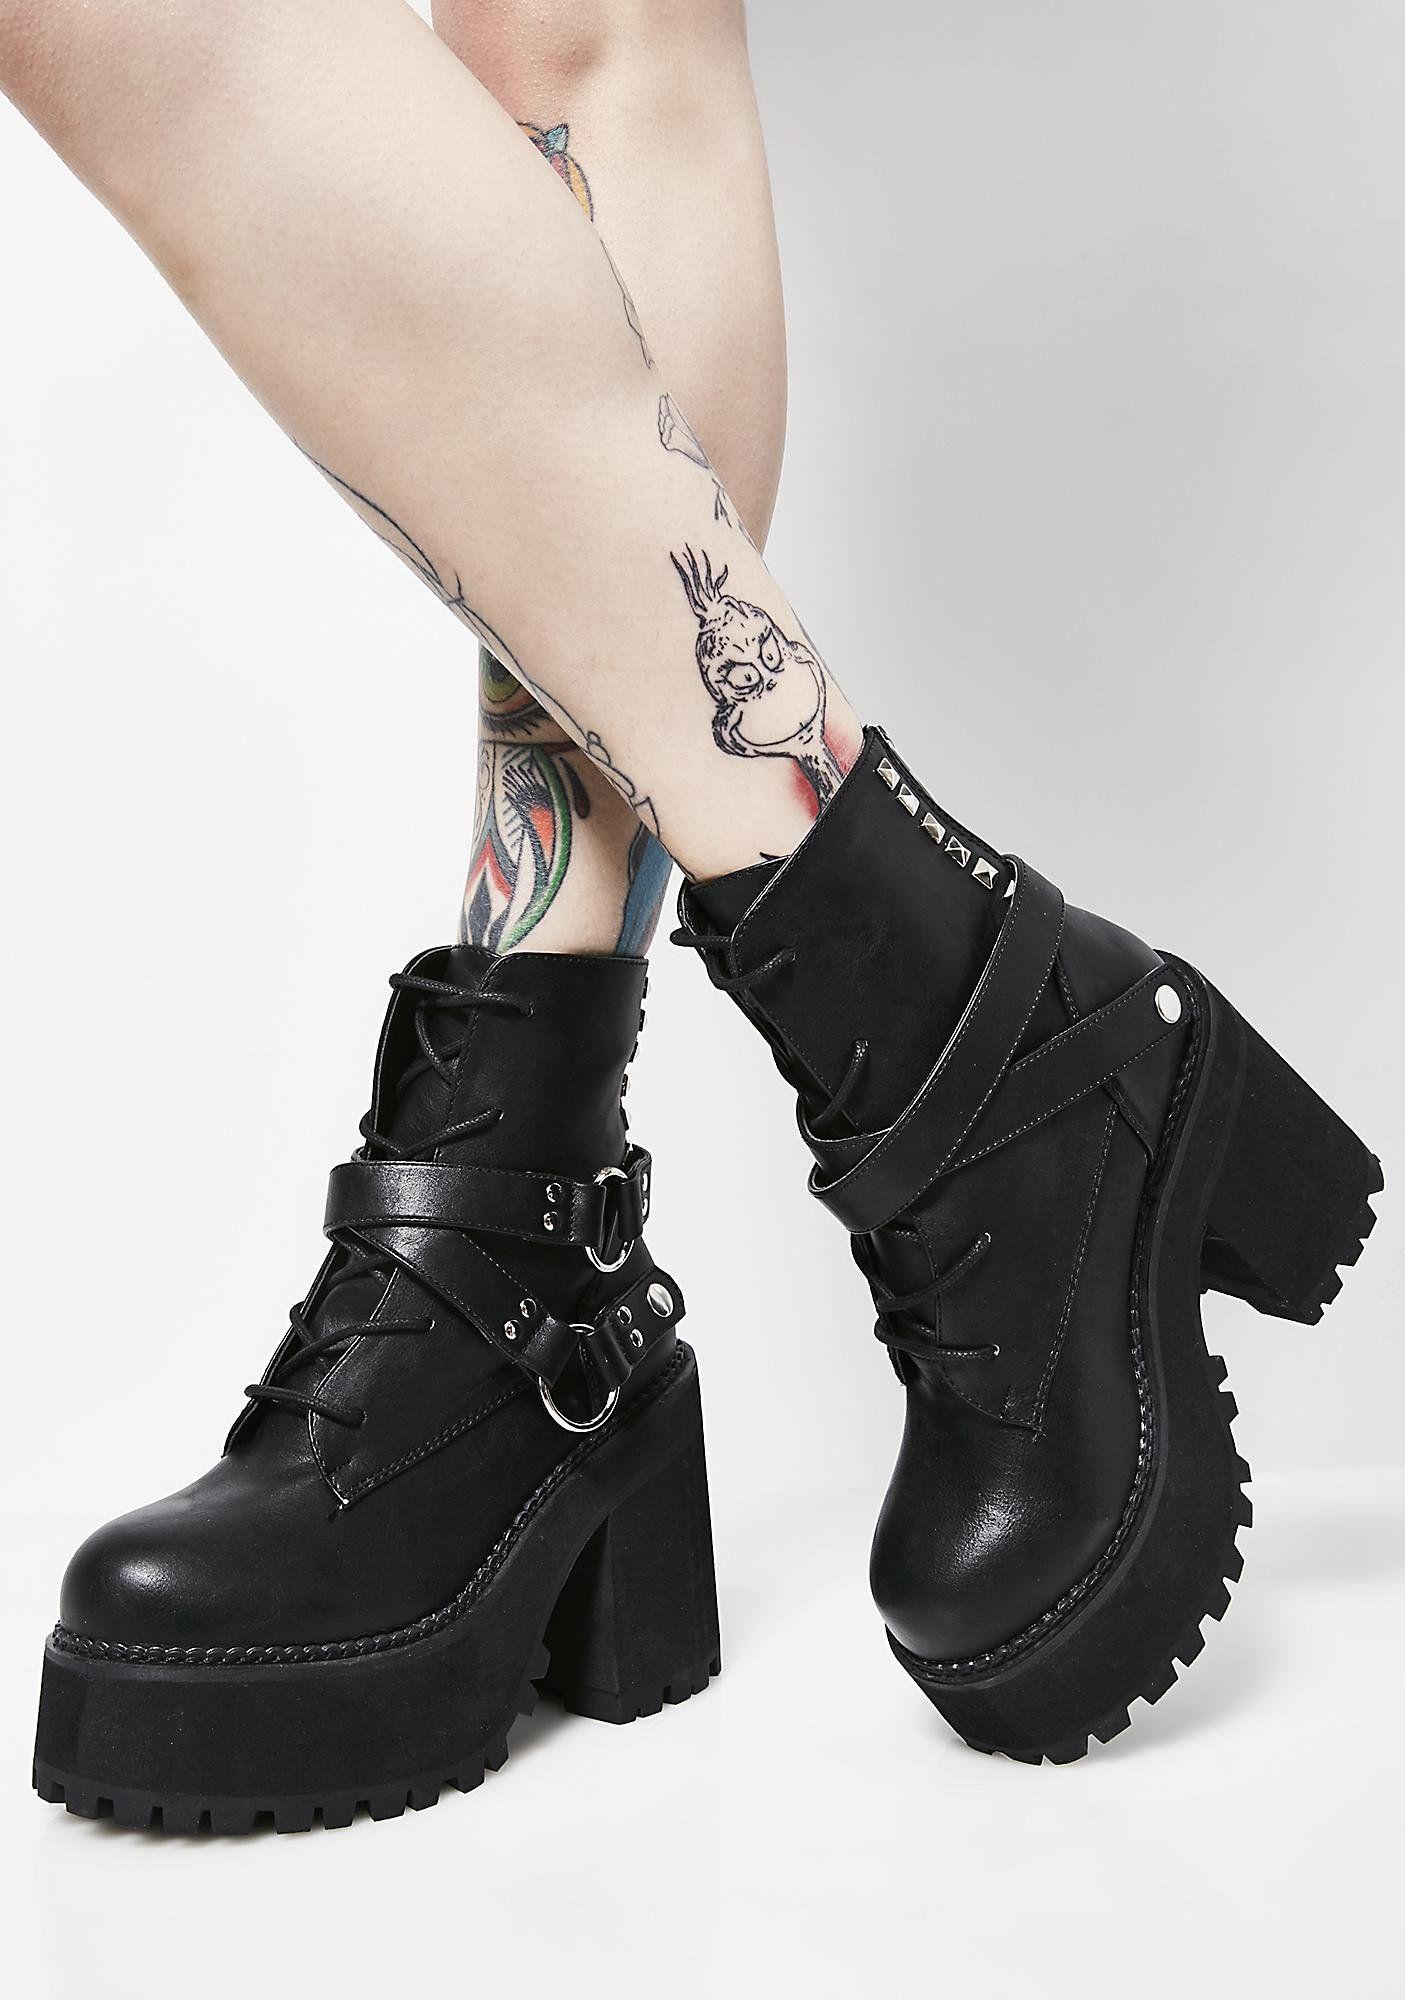 fadd13b98b56 Demonia Reign Of Terror Platform Boots